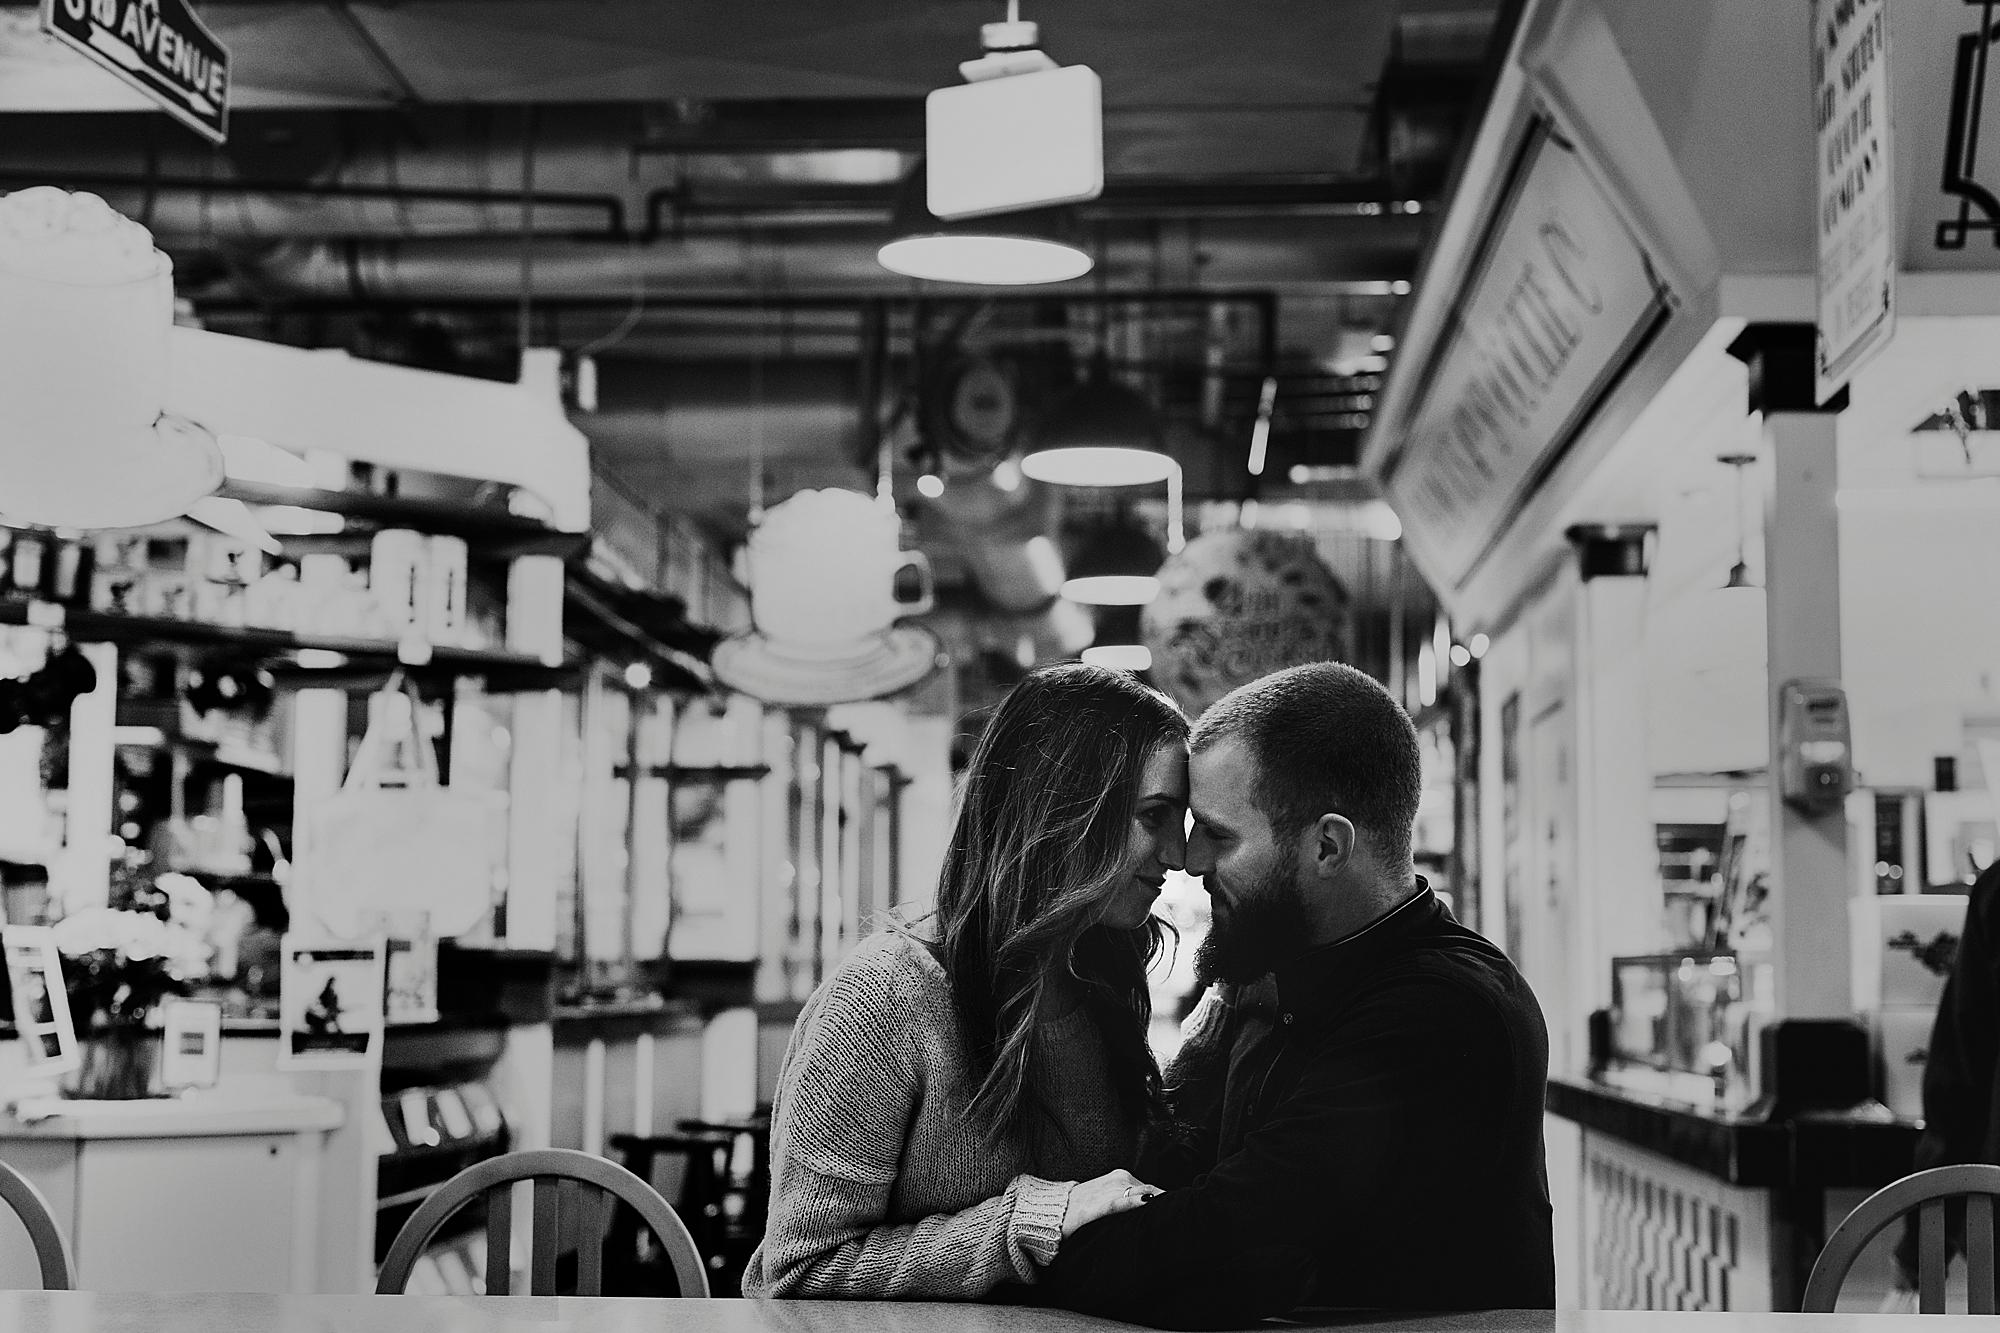 Joe_Mac_Creative_Philadelphia_Philly_Wedding_Photography_Steve_Love_Letters_To_Philadelphia__0034.jpg